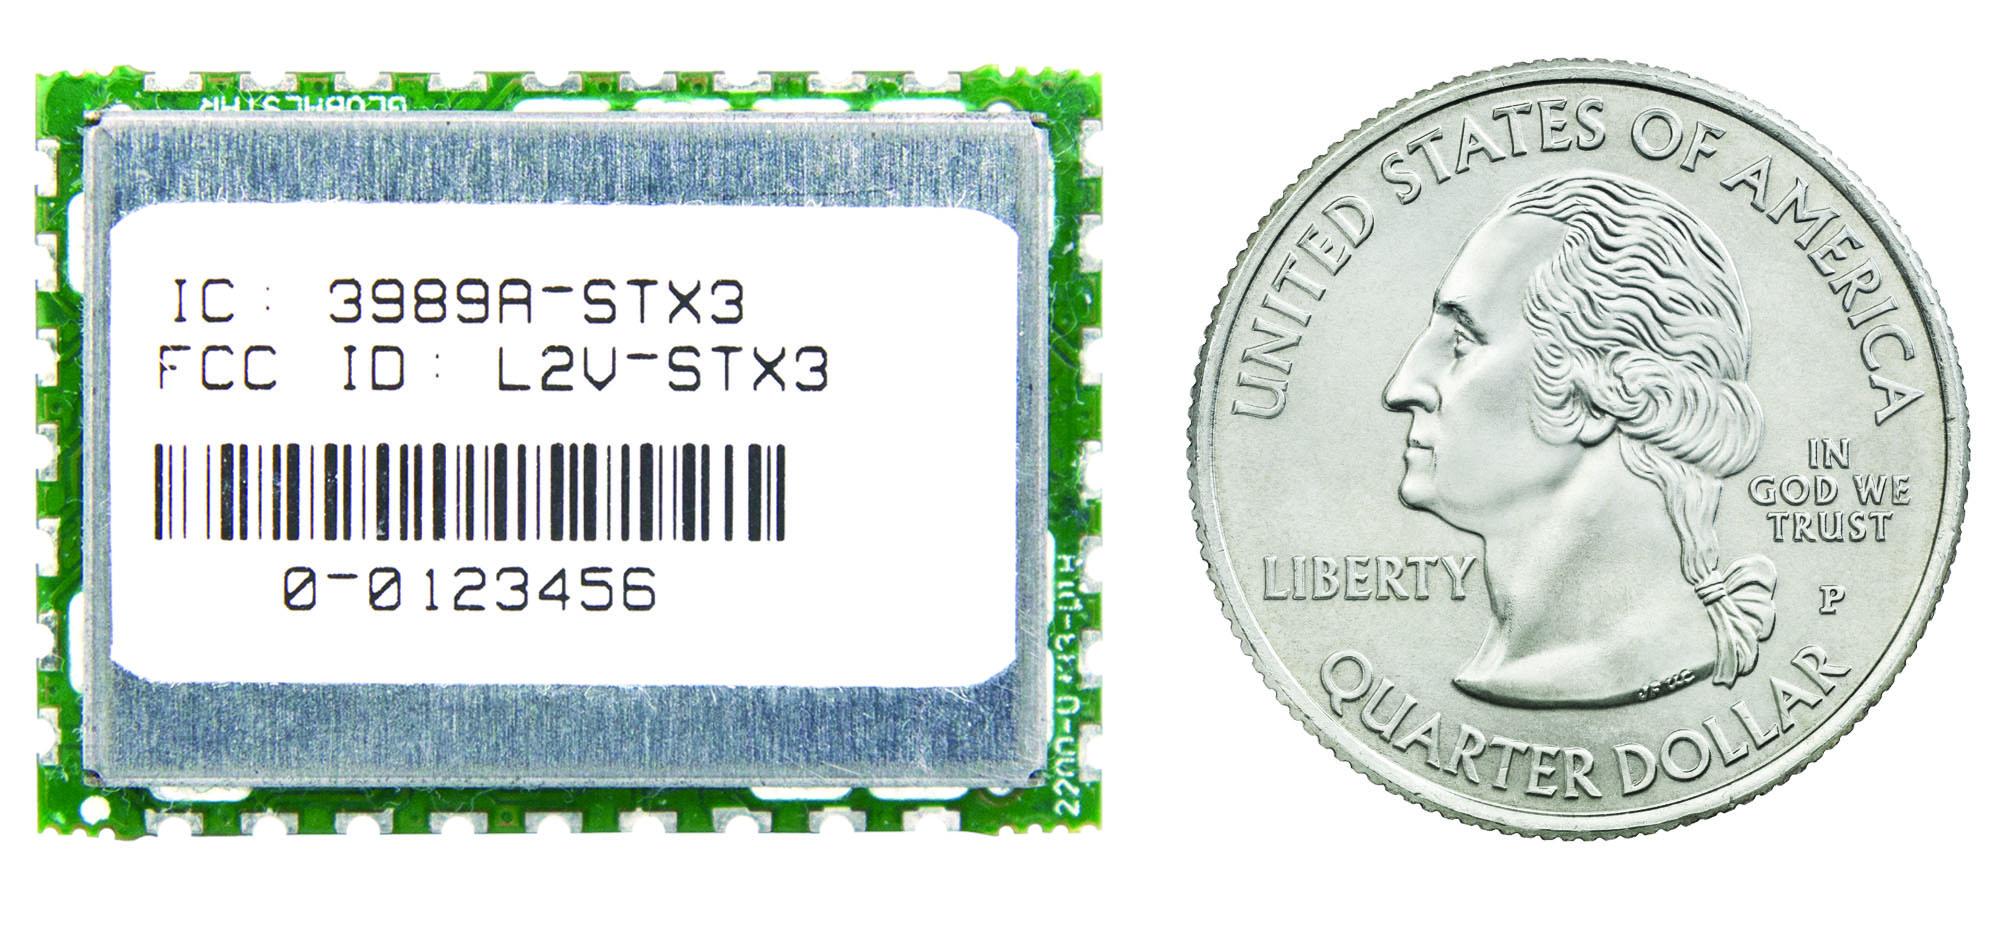 Image to Support Globalstar Identec story 2 - STX3 chipset vs quater